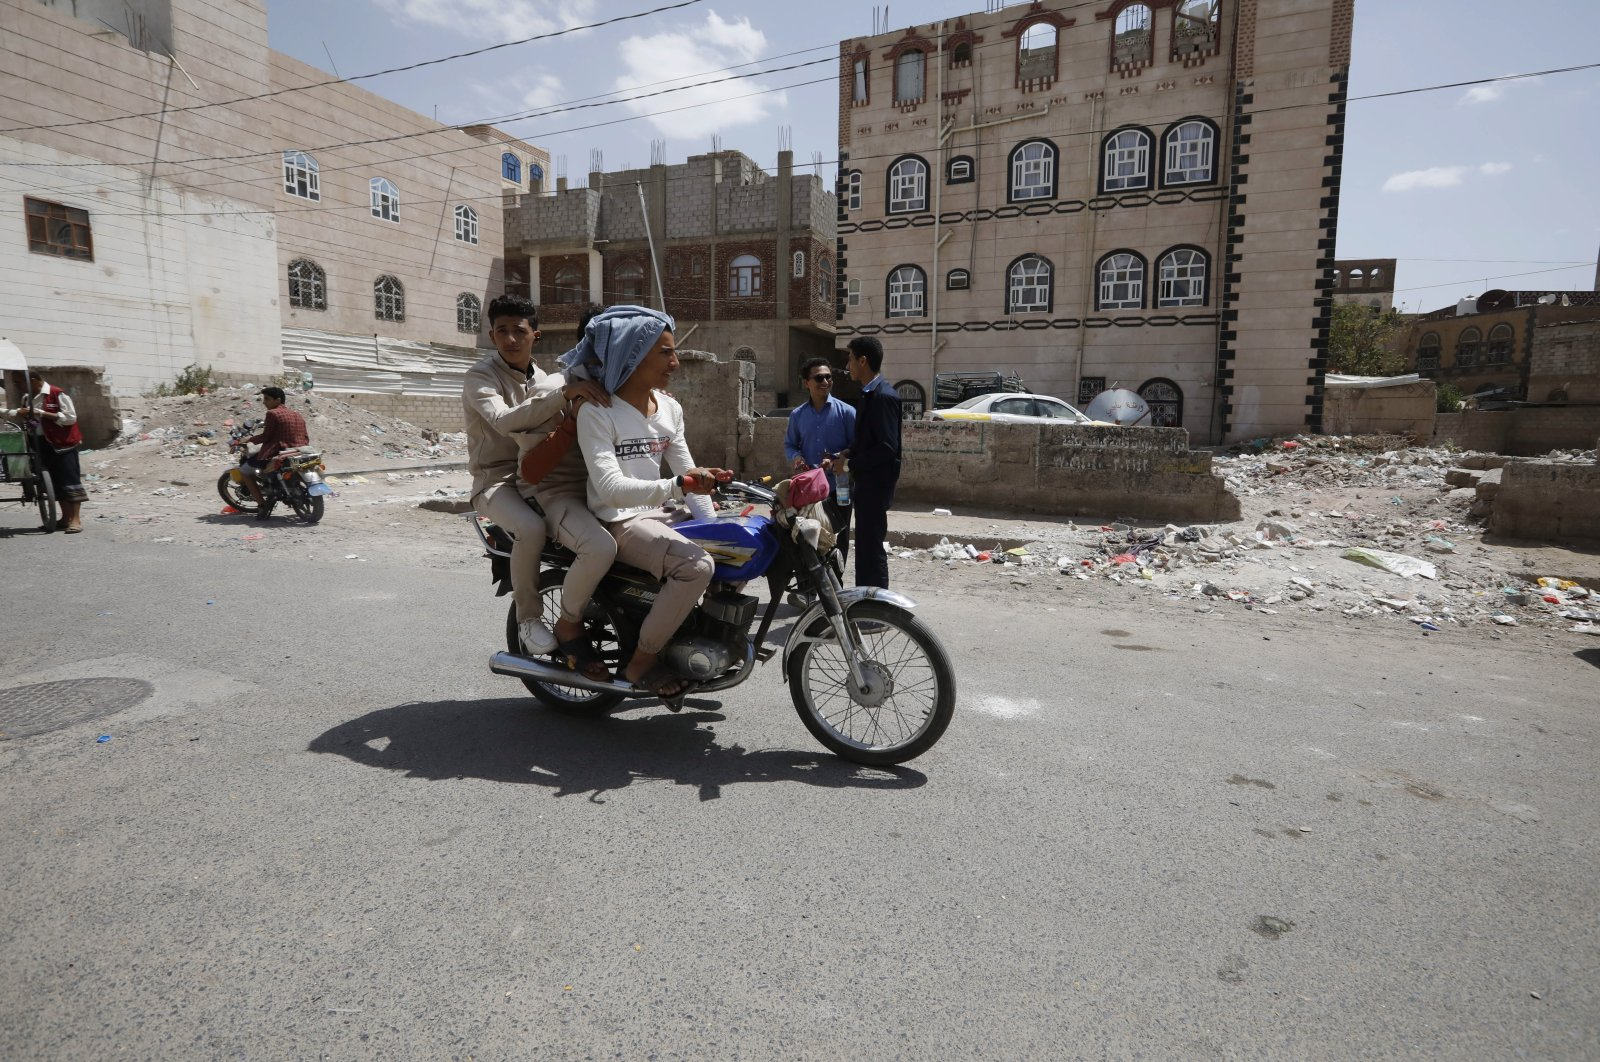 Yemeni students riding a motorcycle leave a public school after taking final school exams in Sanaa, Yemen, July 5, 2021. (EPA Photo)